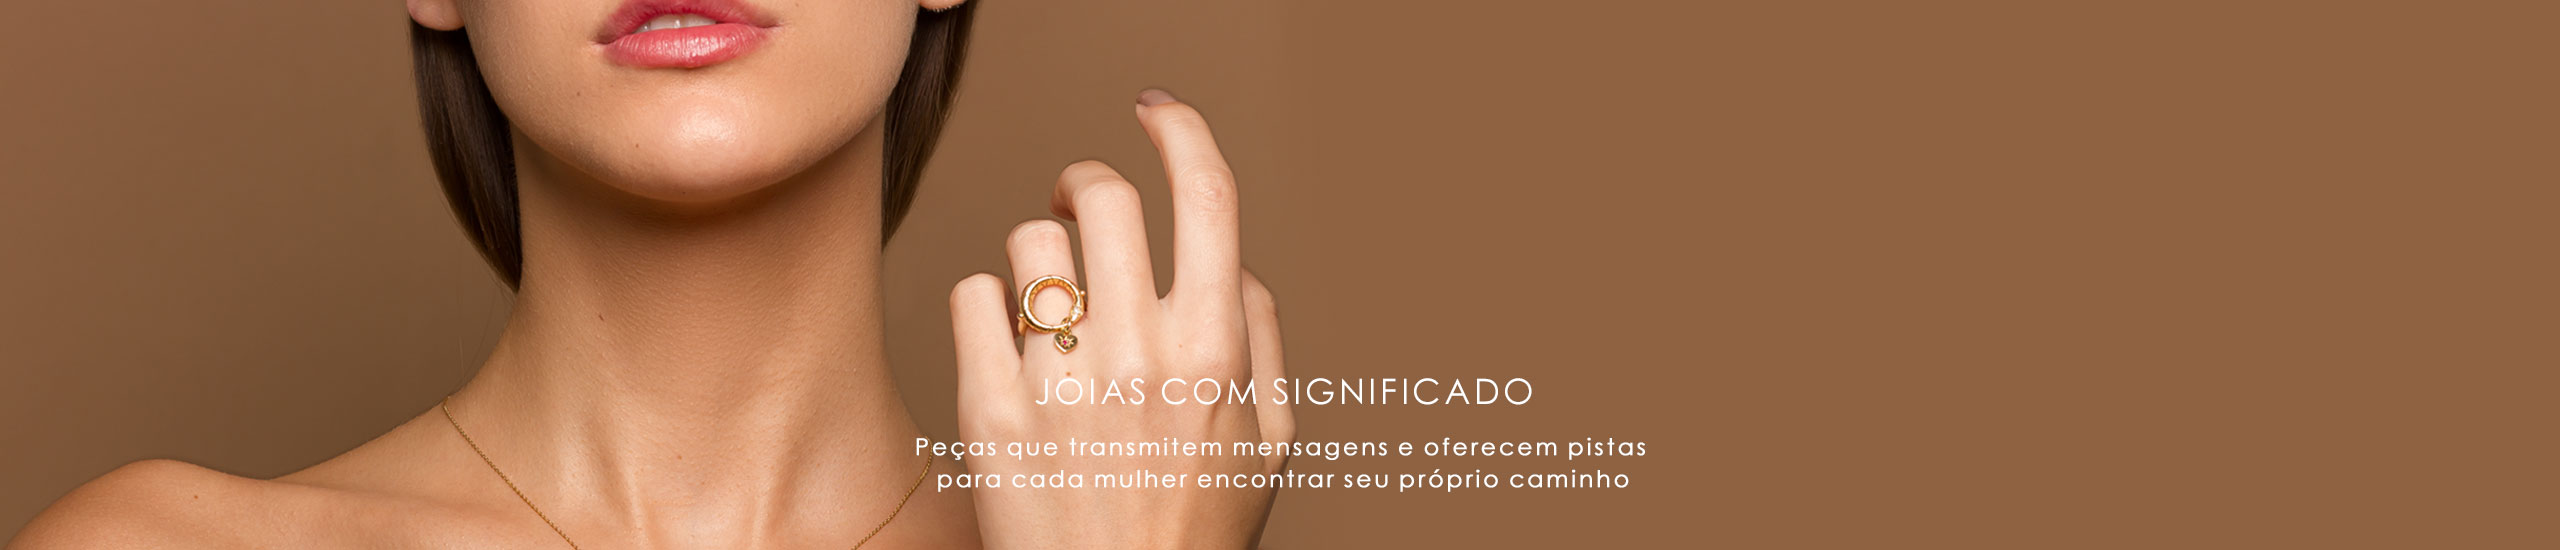 Images_Loia_slider_02